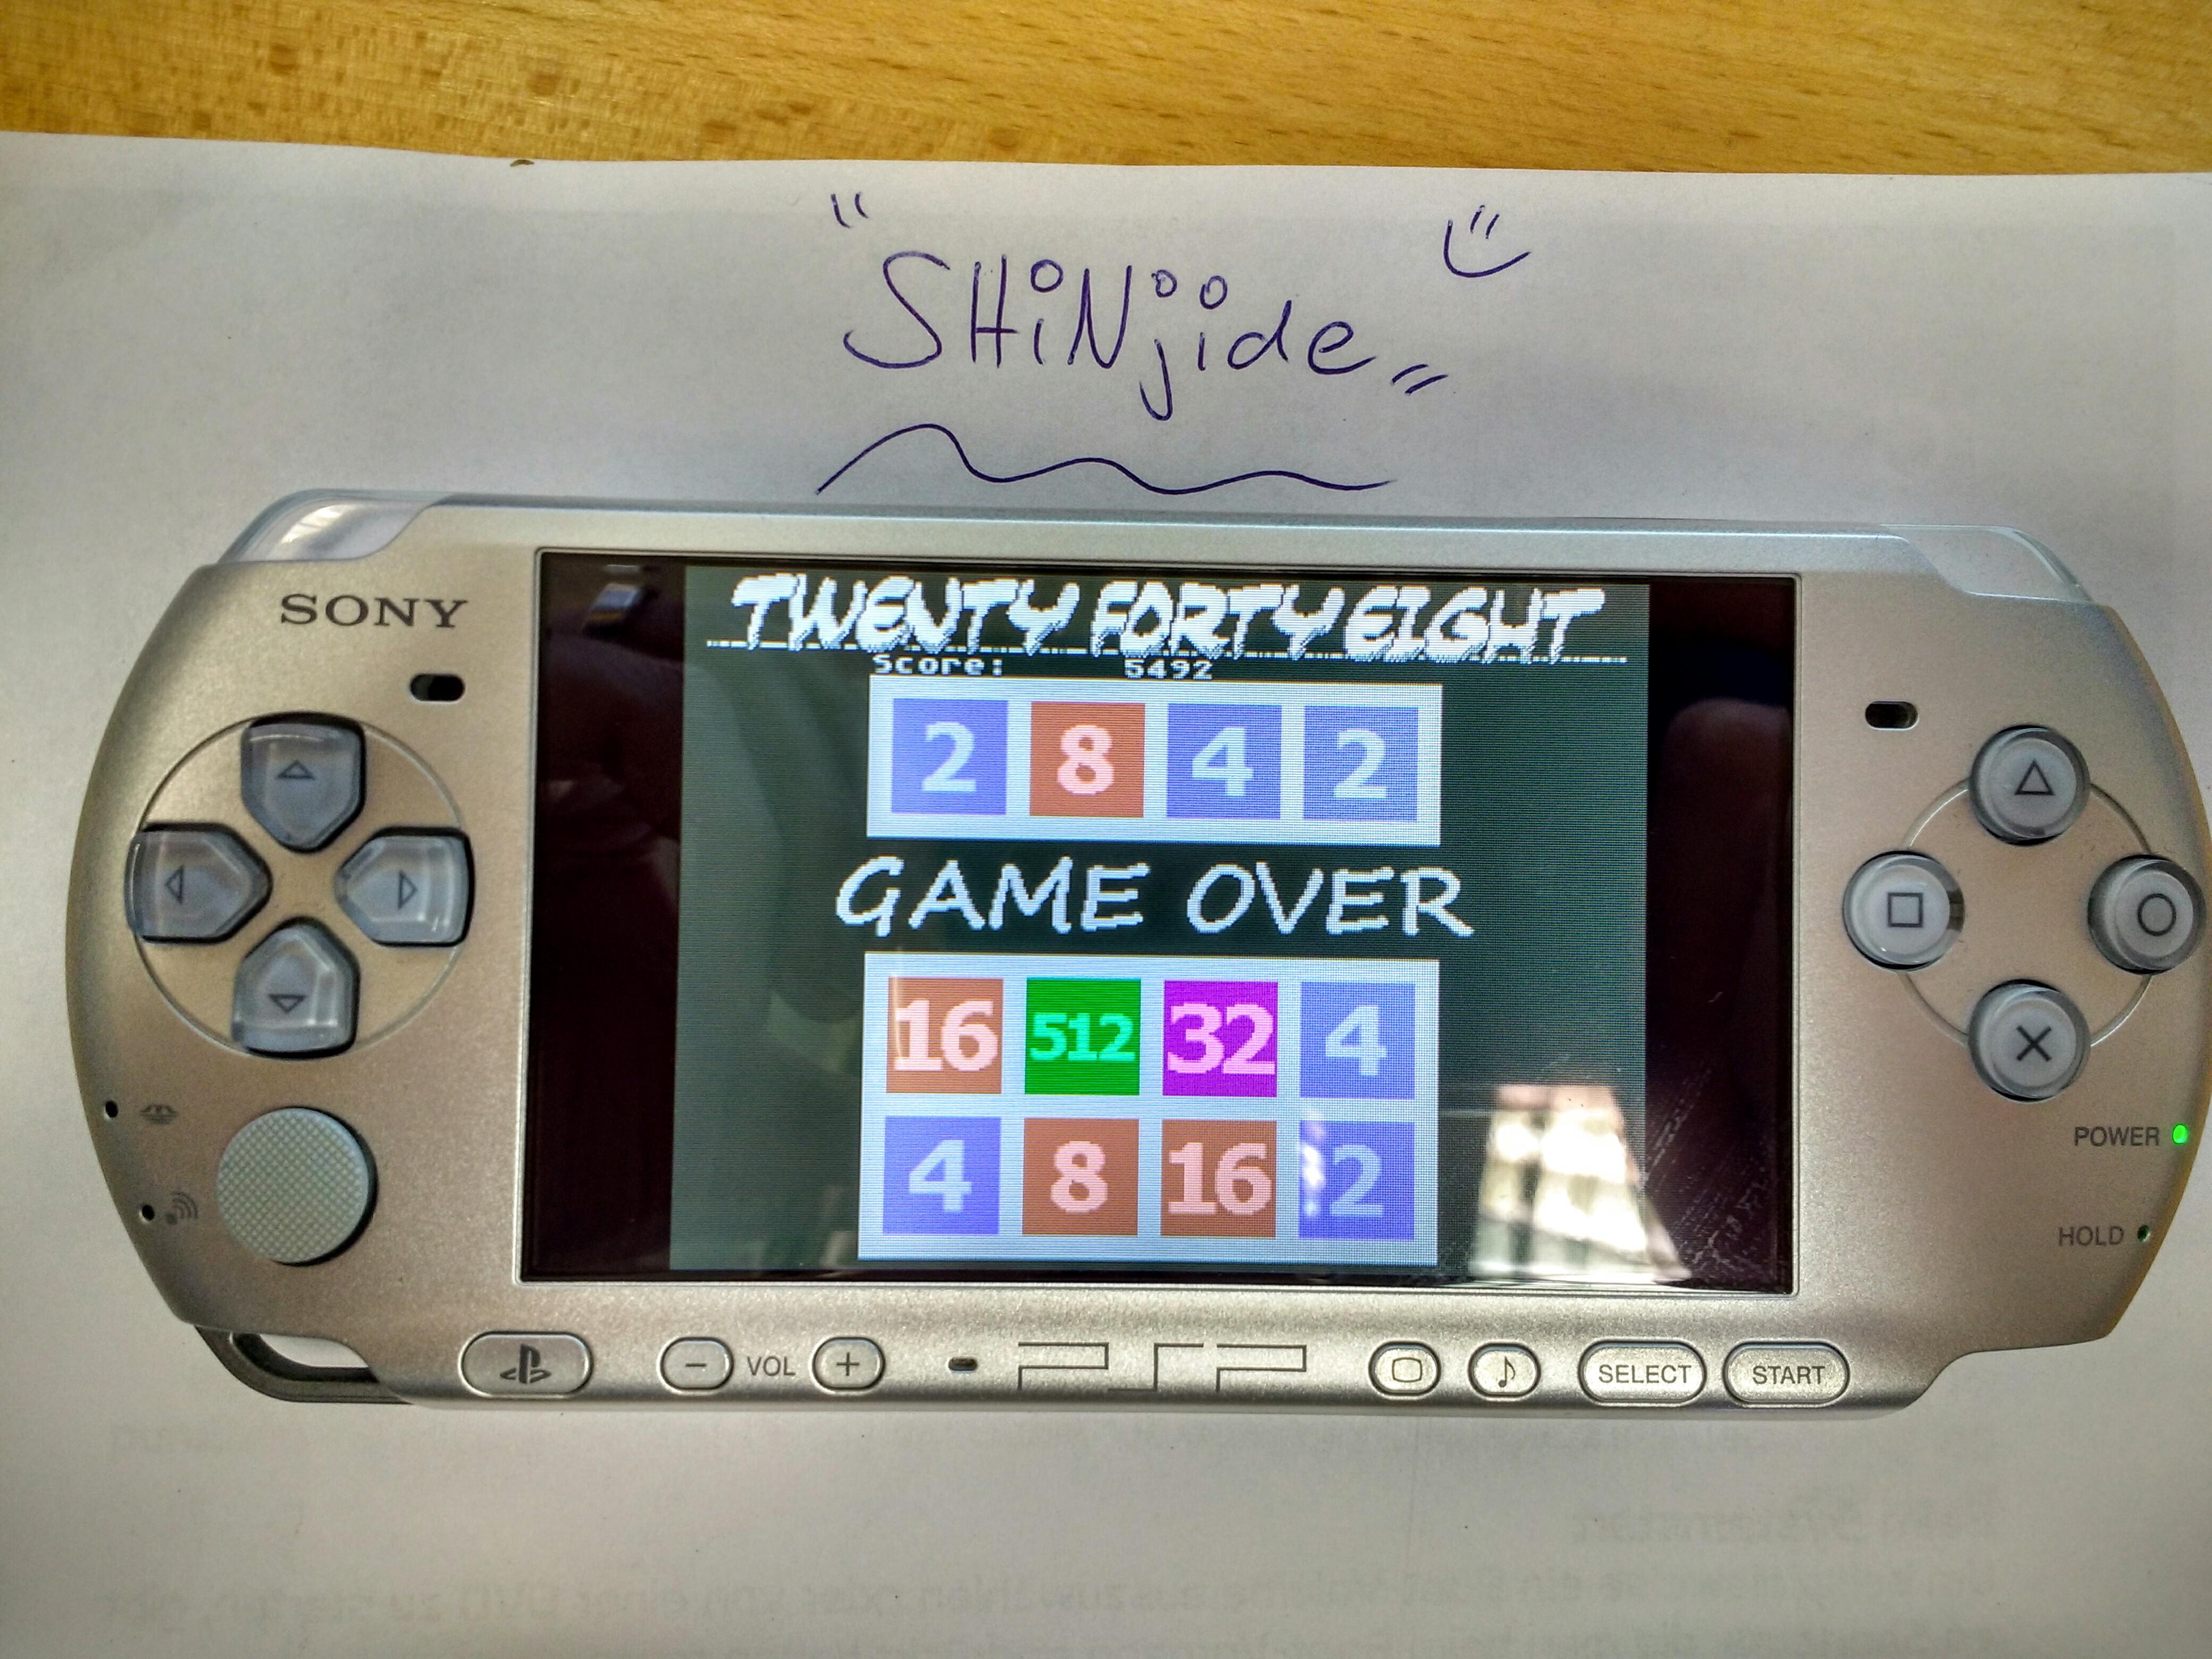 SHiNjide: 2048 (Atari 400/800/XL/XE Emulated) 5,492 points on 2015-11-13 03:51:27